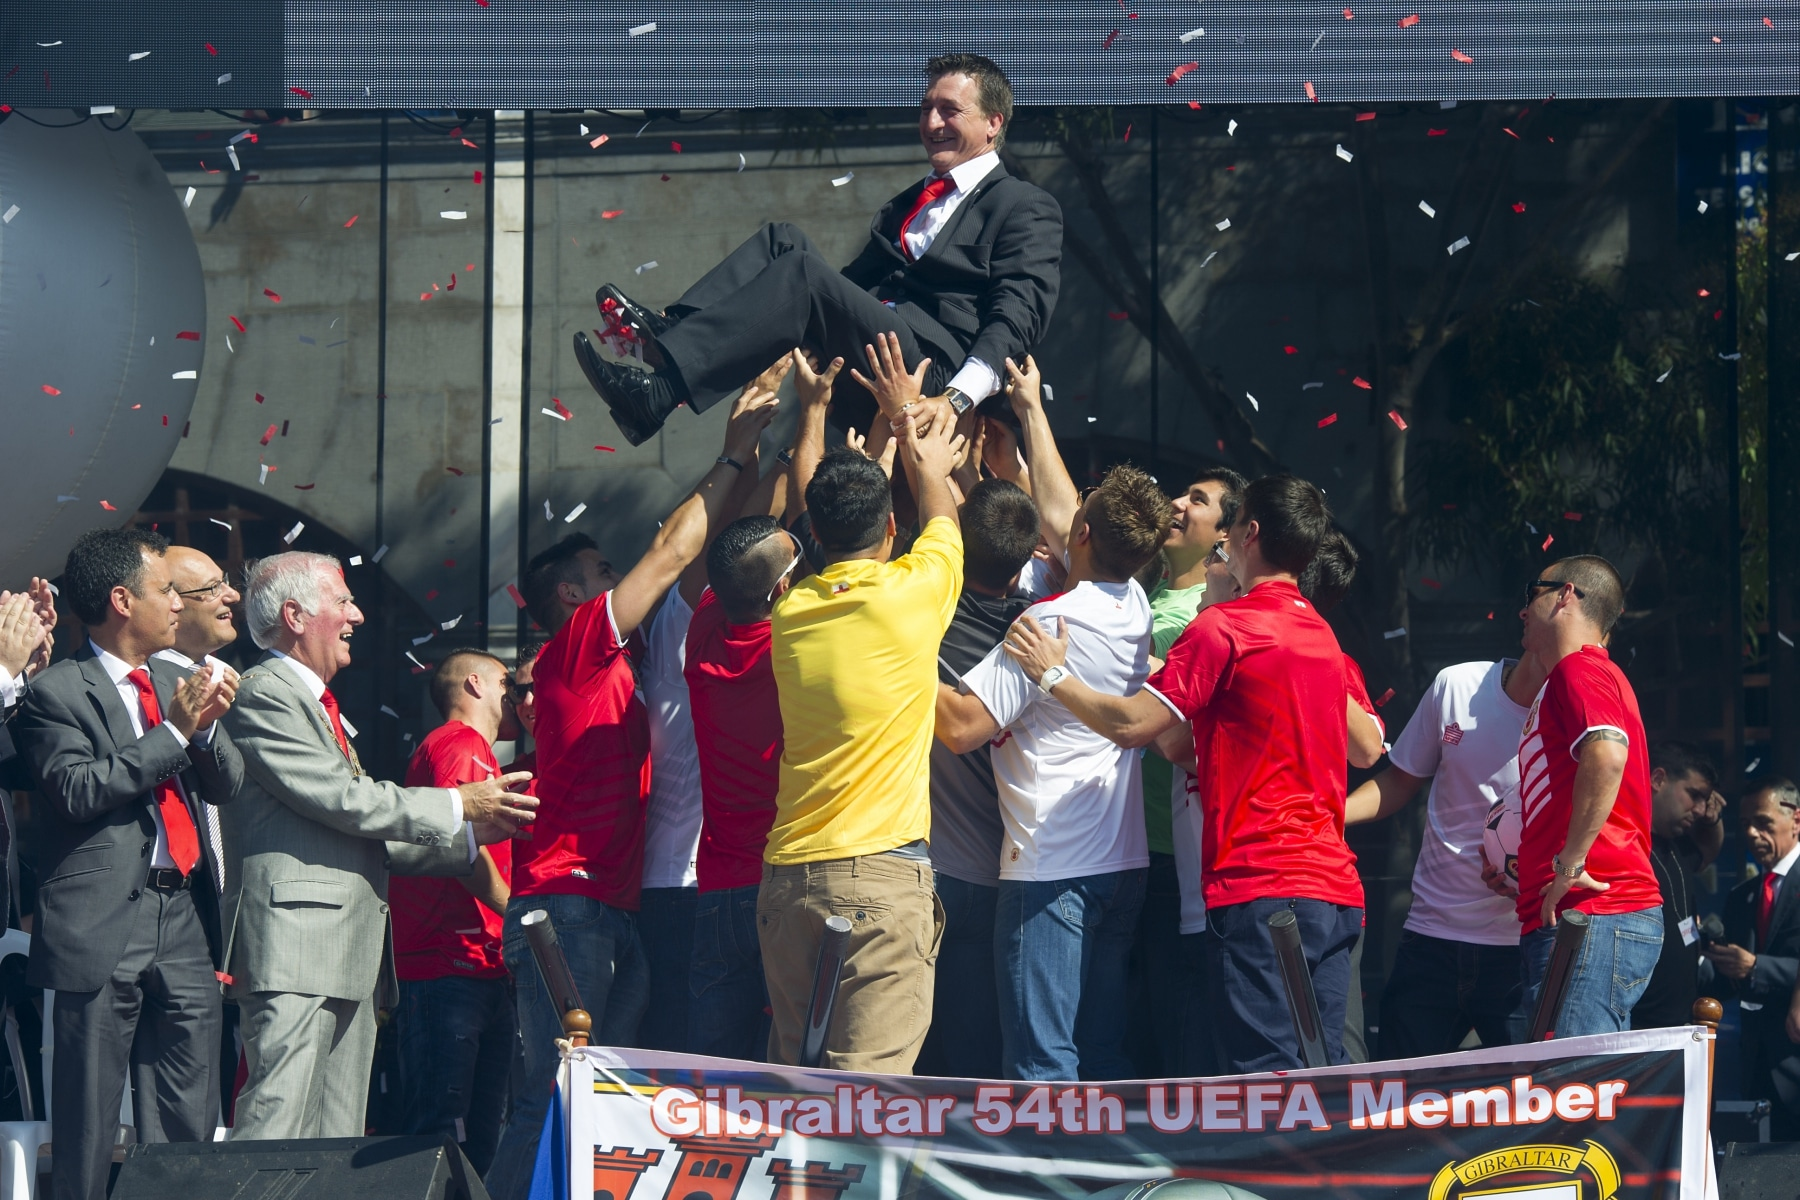 celebracin-entrada-gibraltar-en-la-uefa-14_9222041277_o